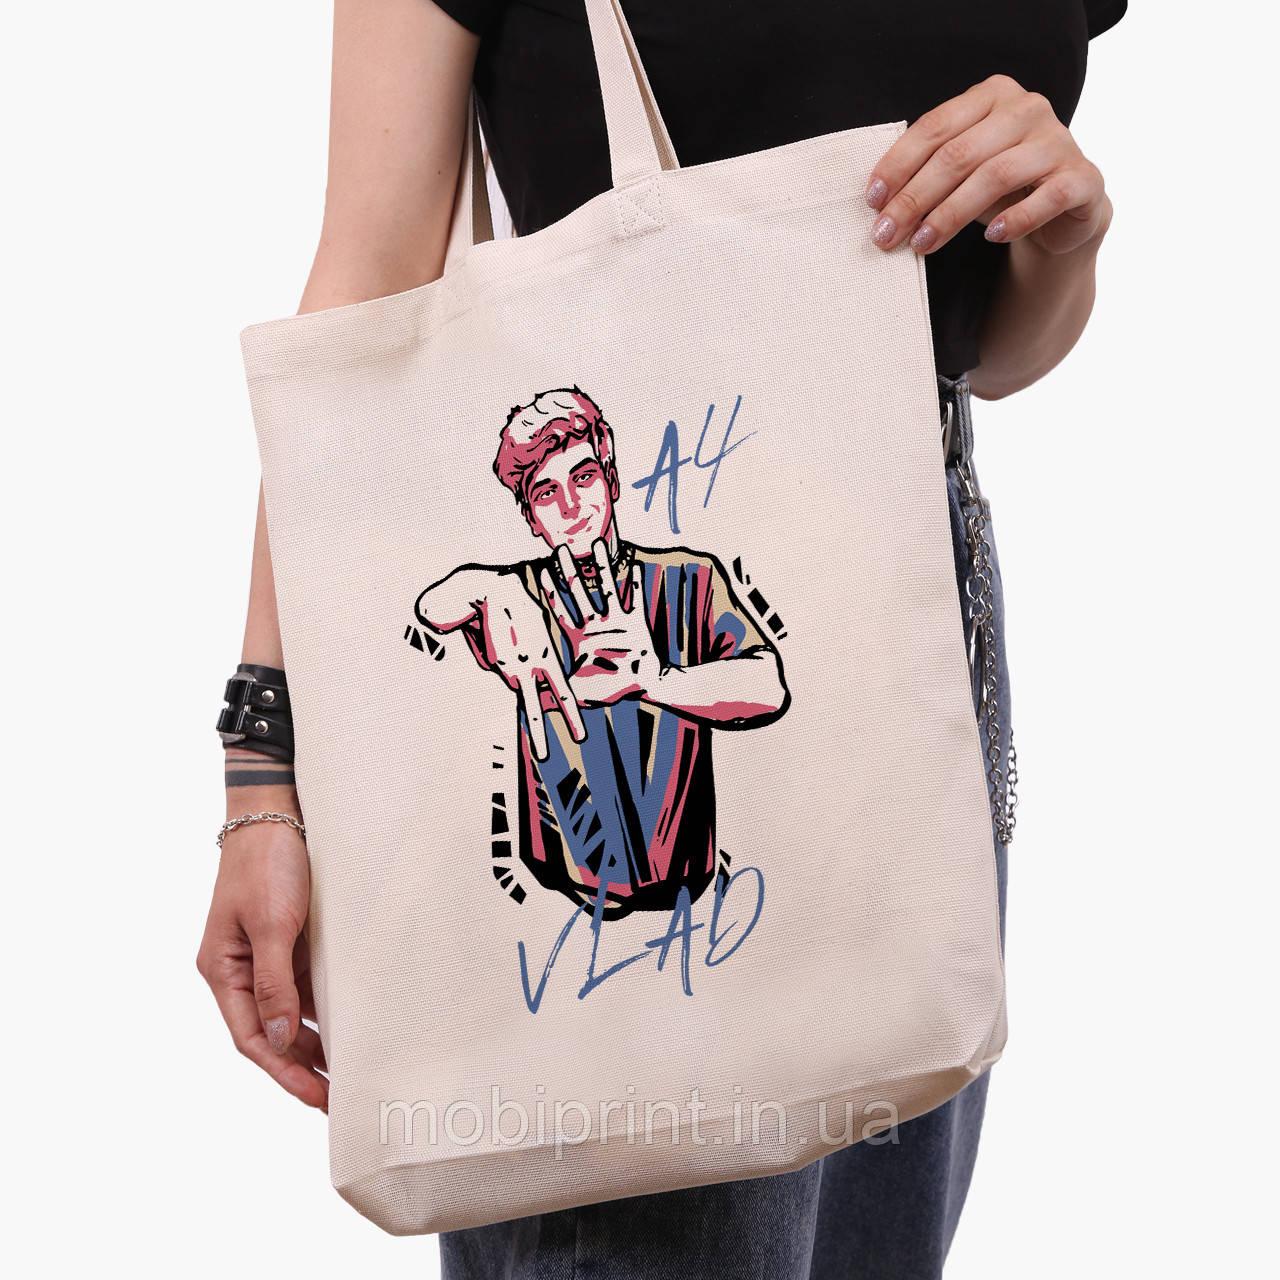 Эко сумка шоппер белая блогер Влад Бумага А4 (blogger Vlad A4) (9227-2621-1)  41*39*8 см